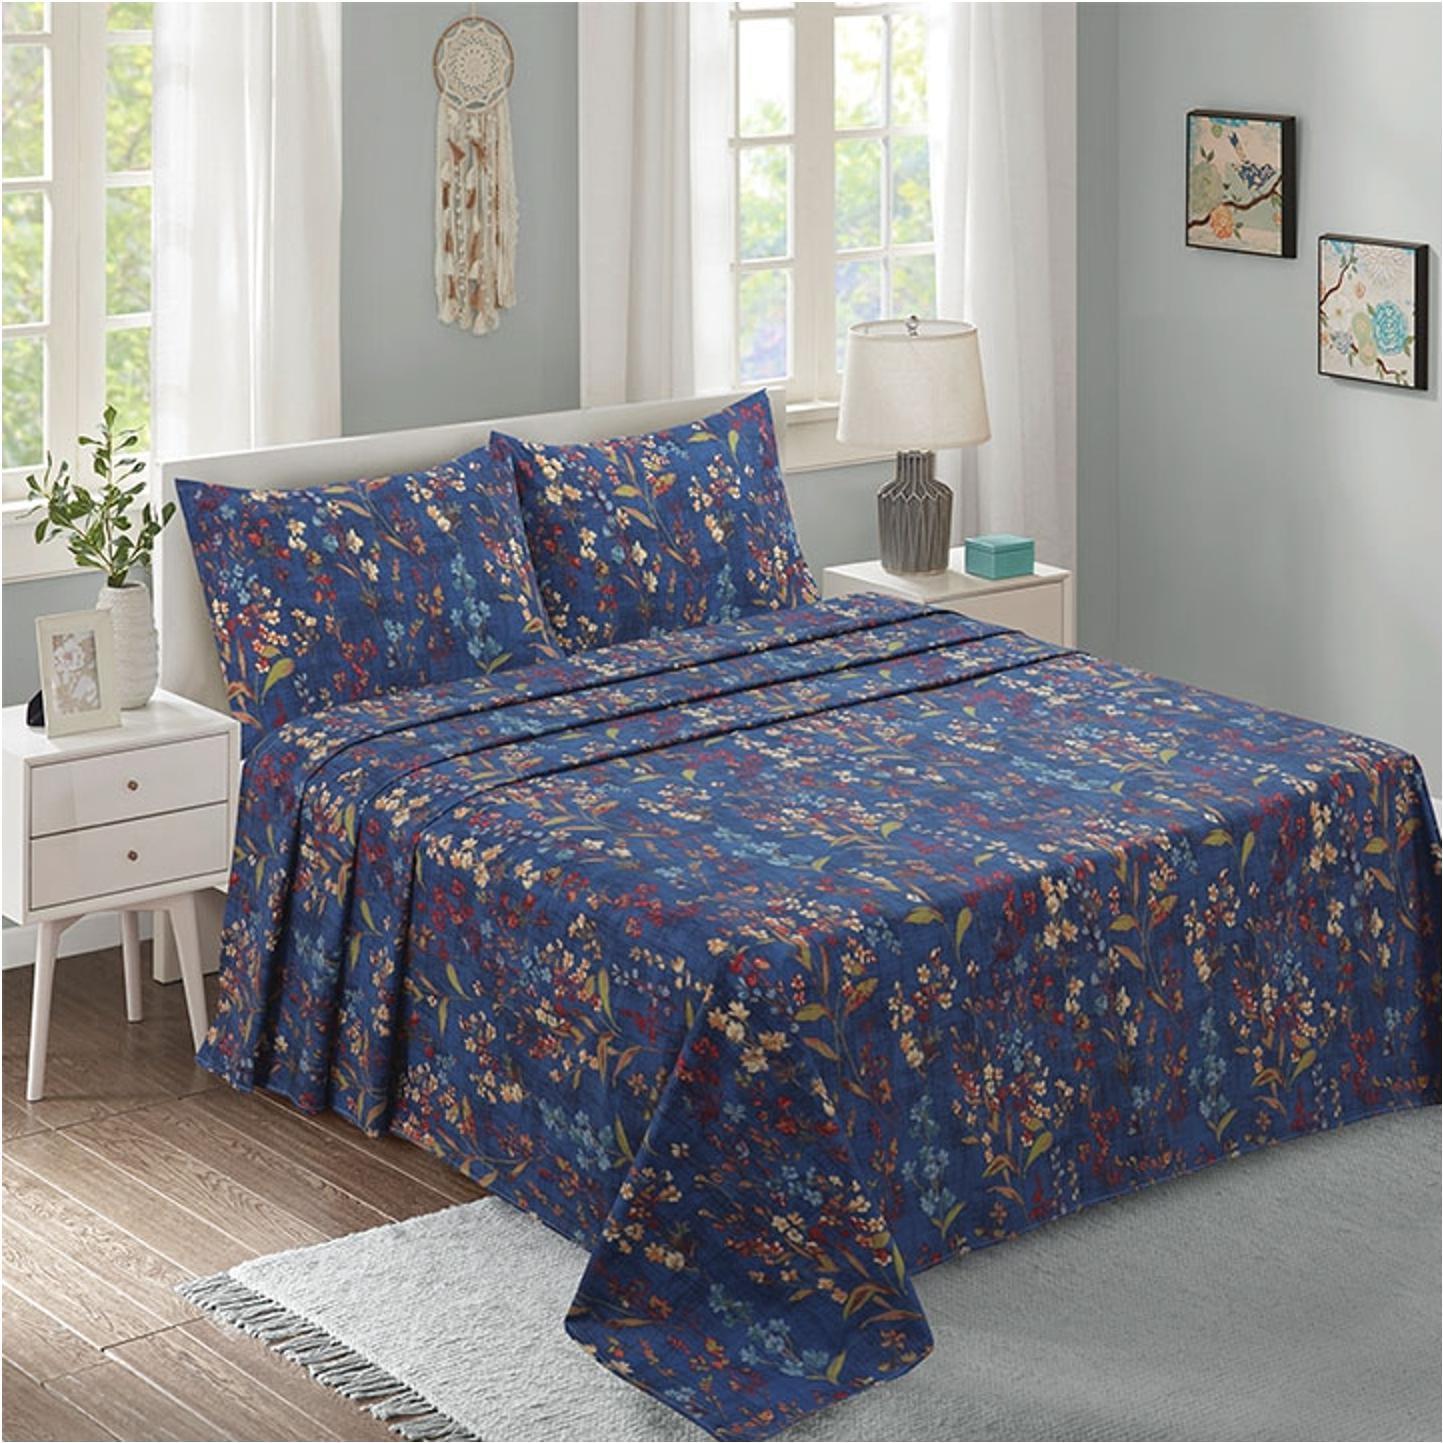 Lino Home Παπλωματοθηκη Υπέρδιπλες 220×240 Moorland Blue